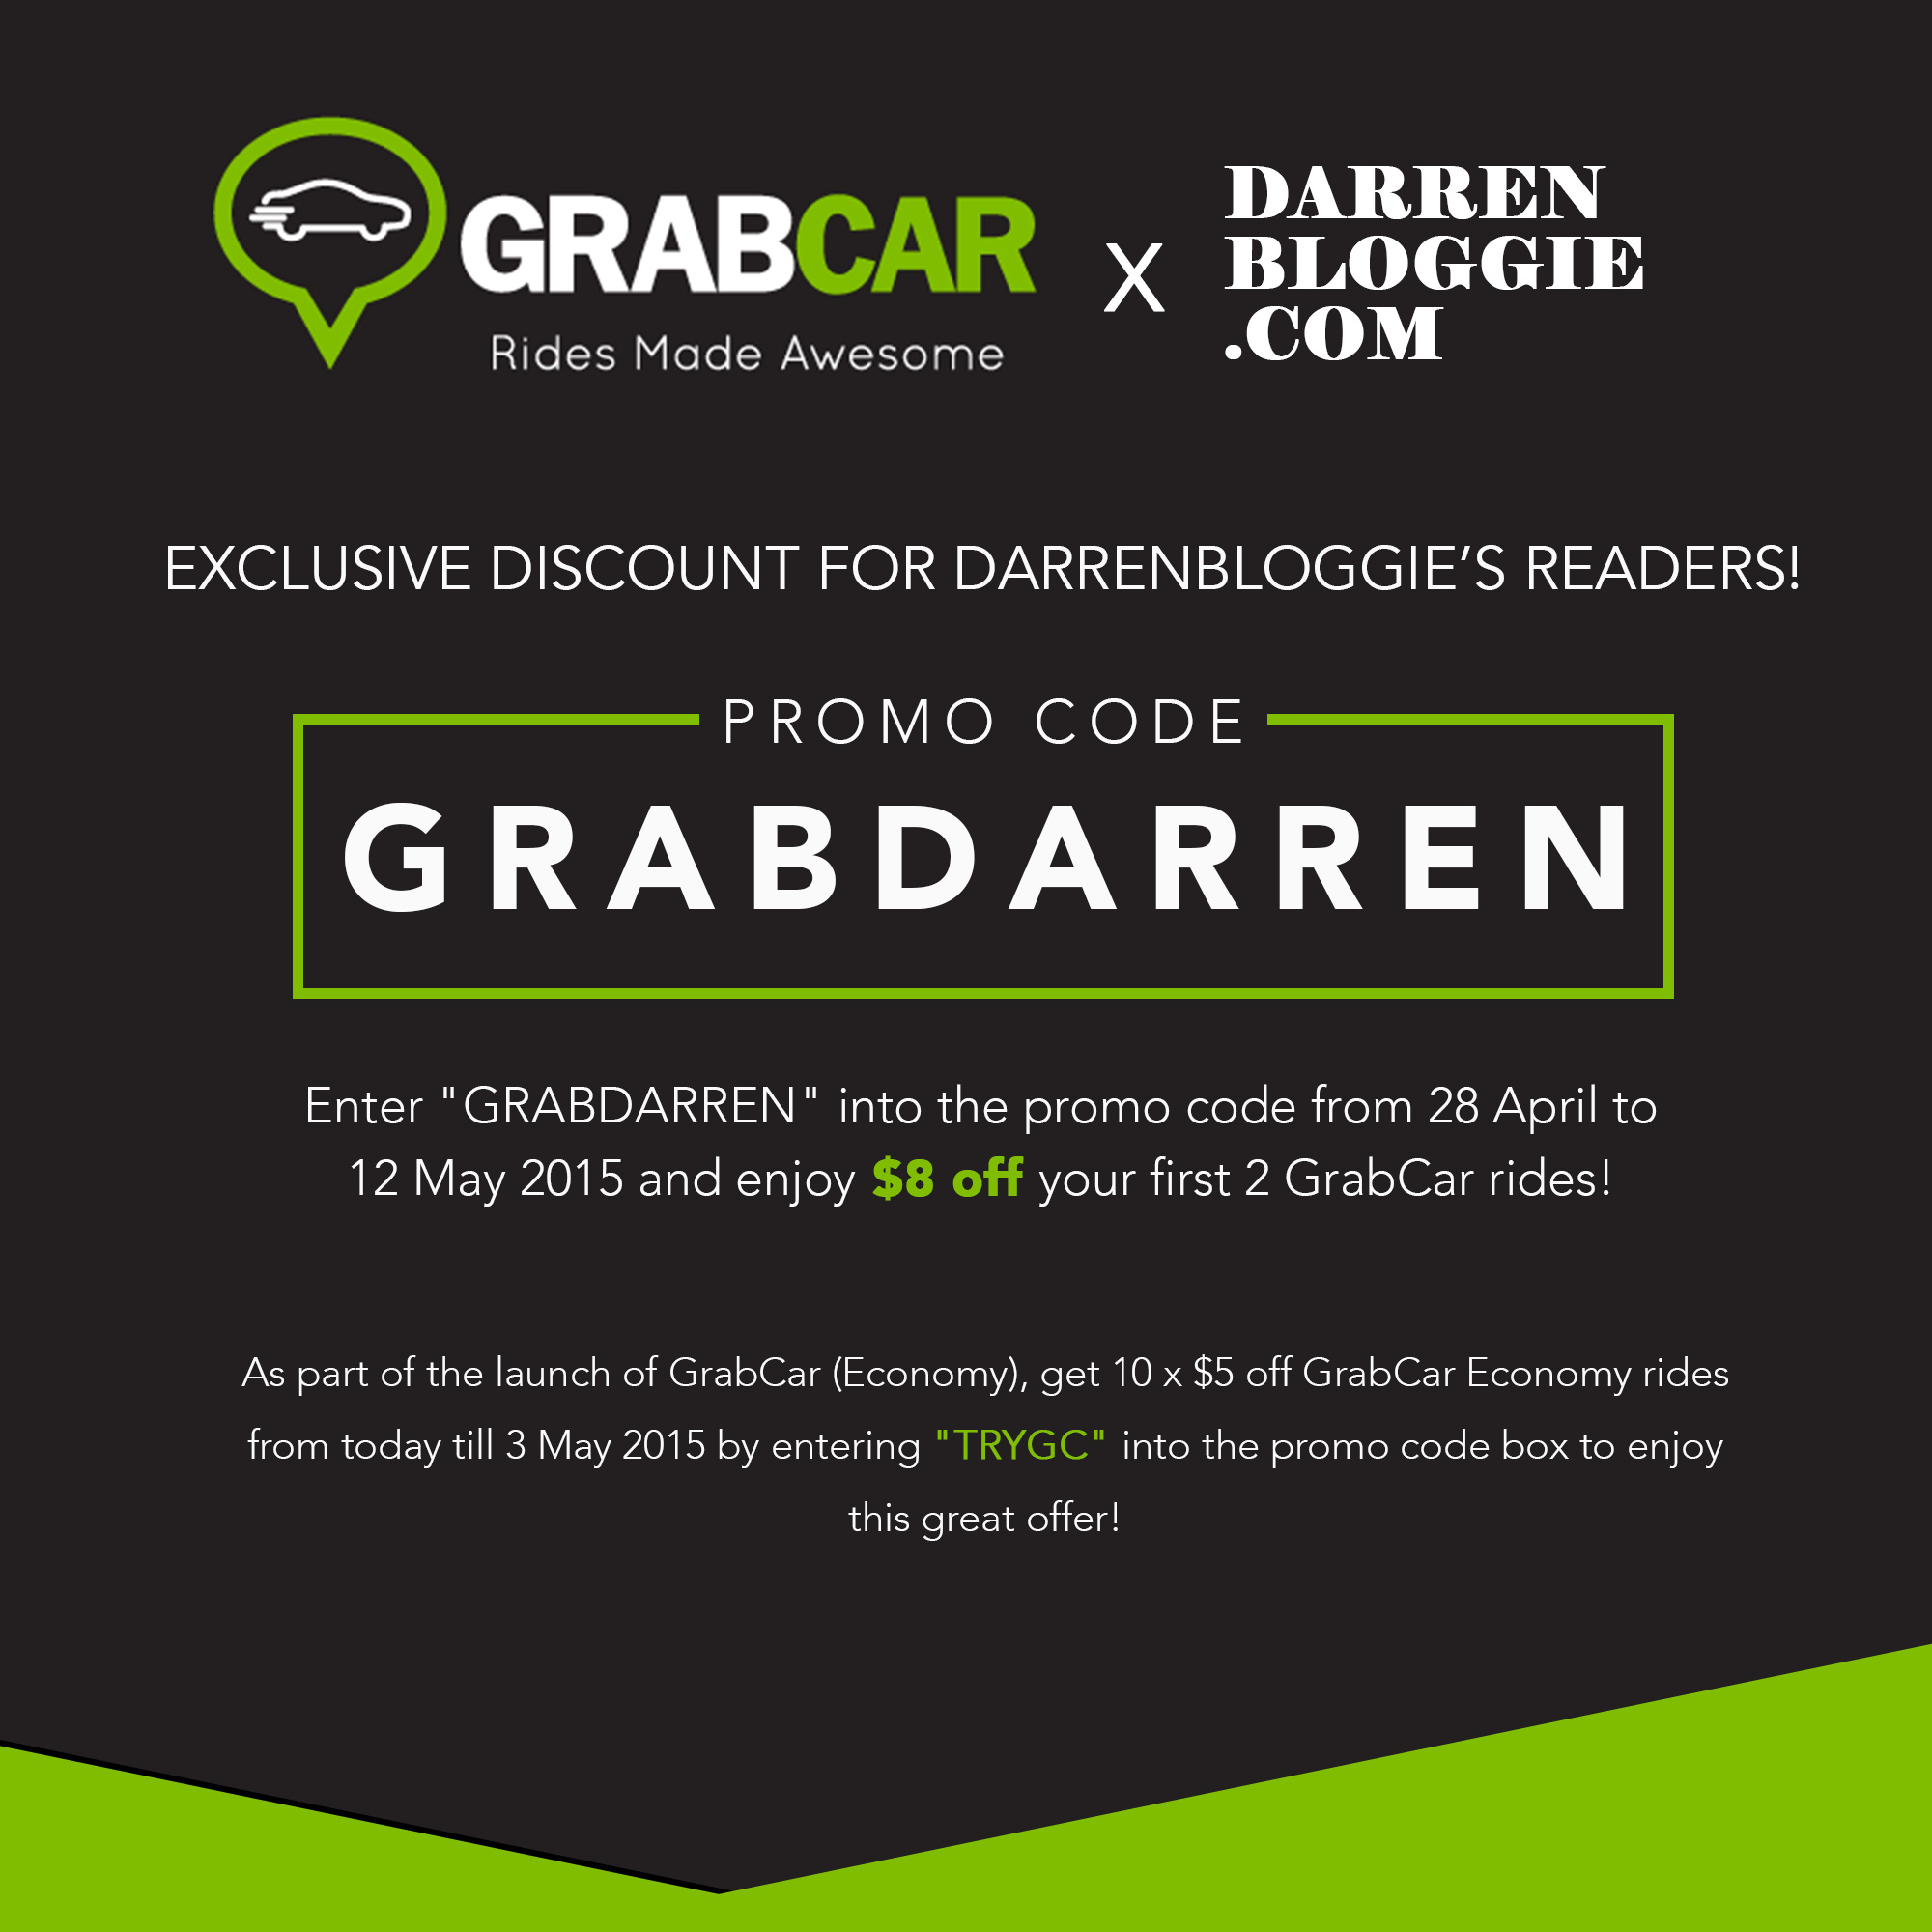 GrabCar_promocode_darrenbloggie